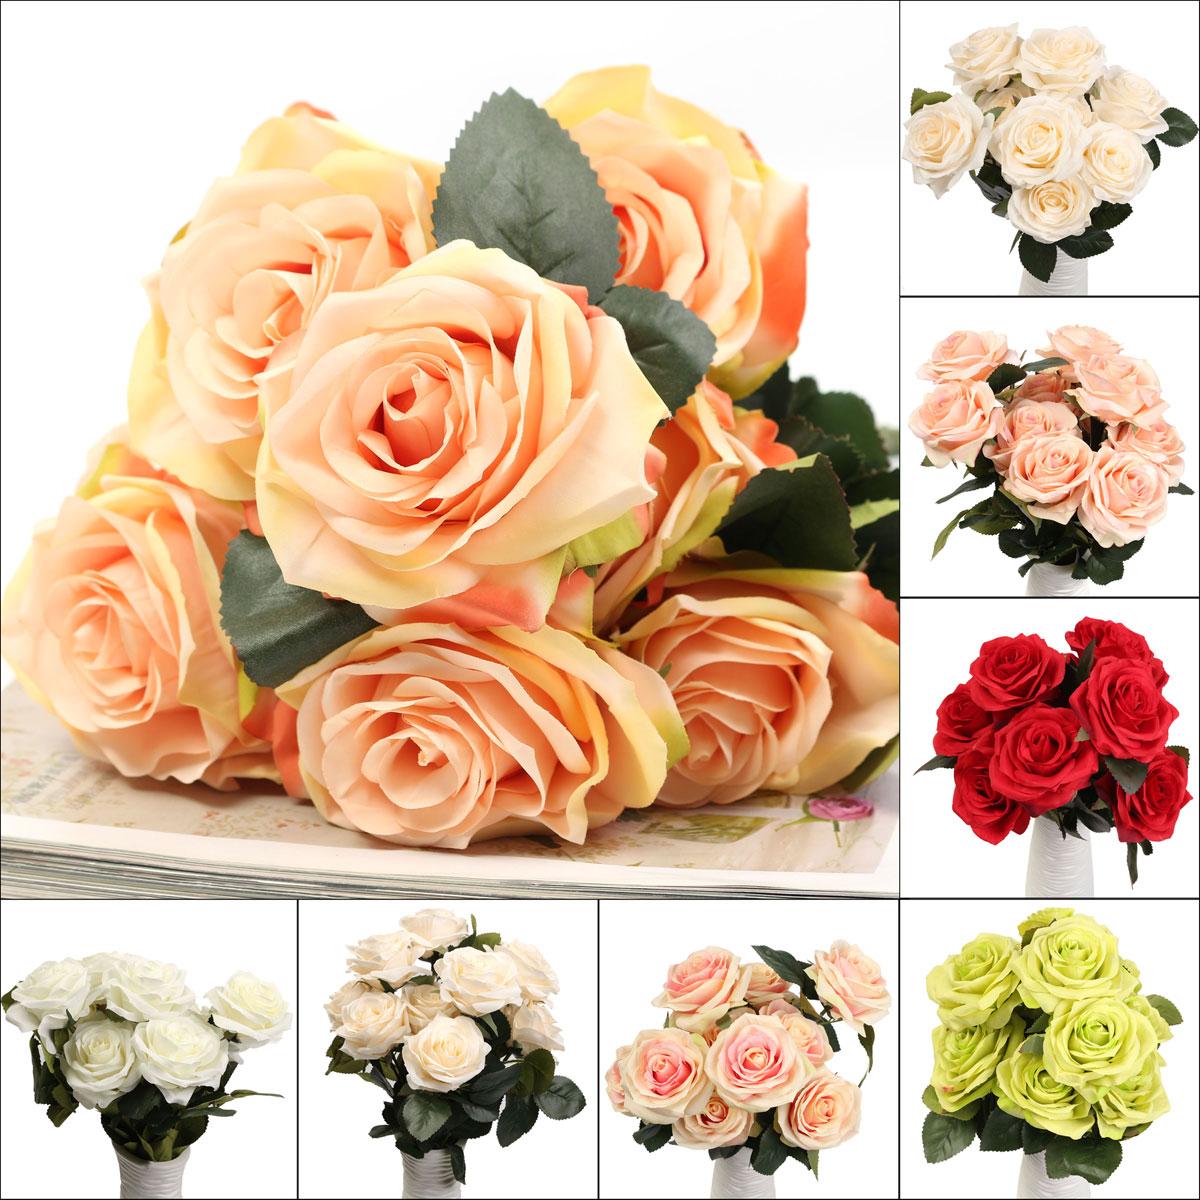 10 Head 1 BouquetAartificial Rose Flower Fake Silk Rose Flower Home Room Wedding Party Decor